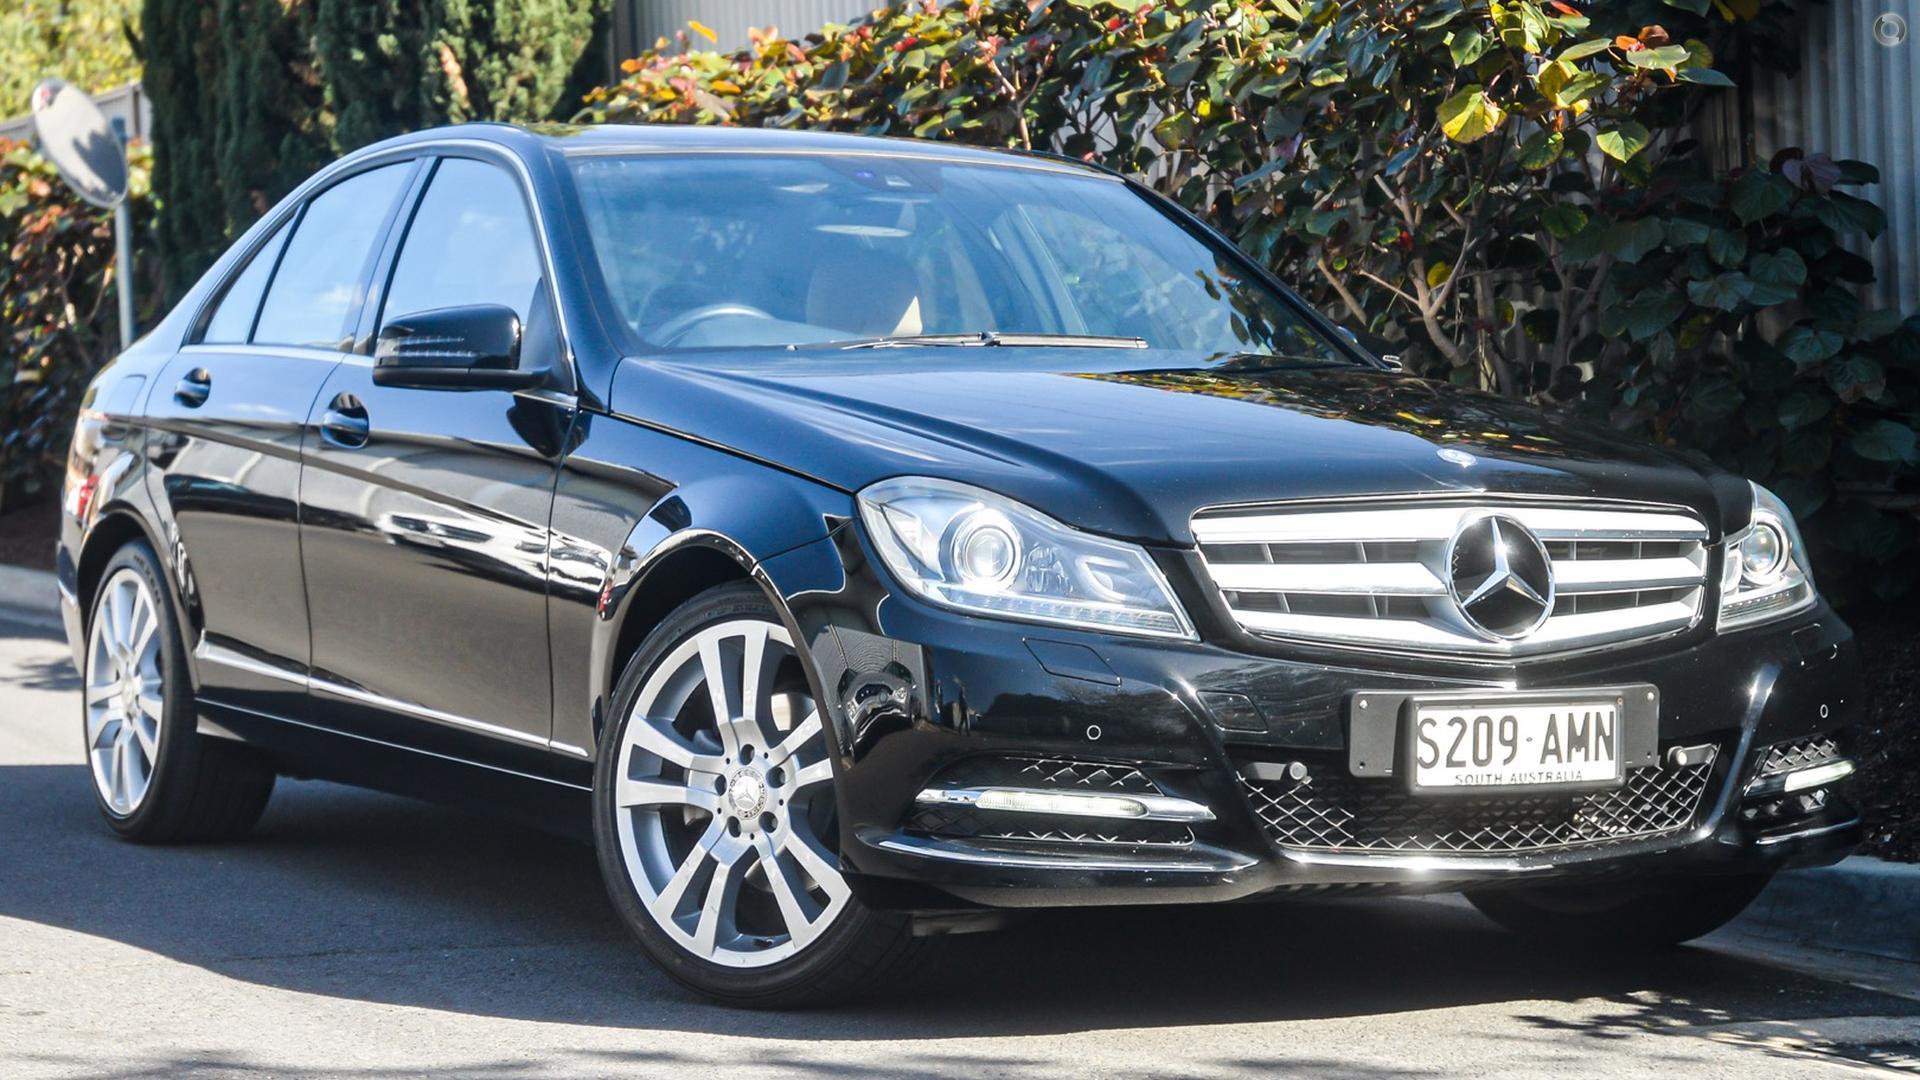 2011 Mercedes-Benz C-CLASS Sedan